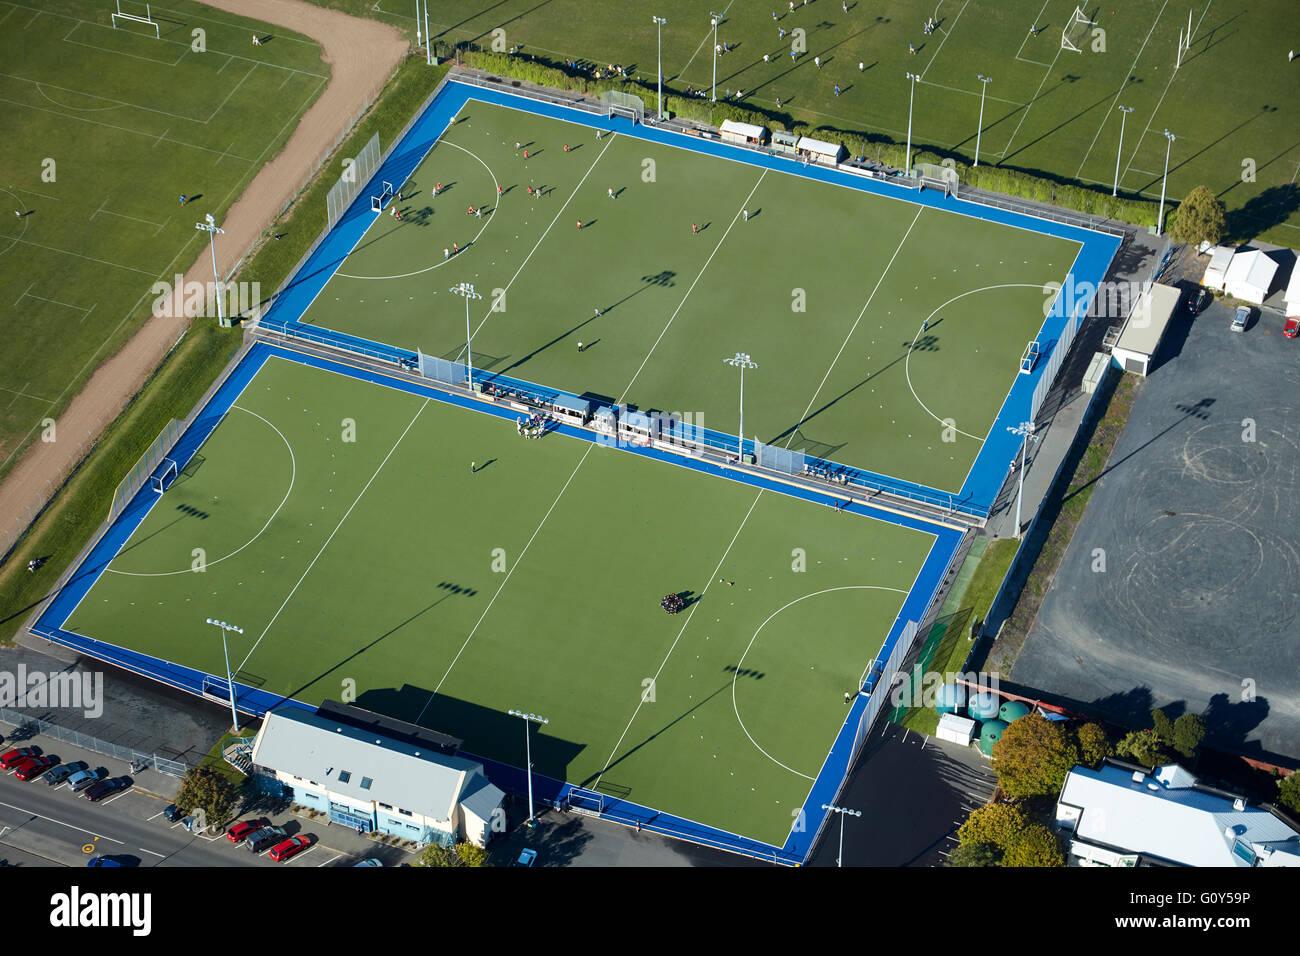 McMillan Hockey Centre, Logan Park, Dunedin, Otago, South Island, New Zealand - aerial - Stock Image